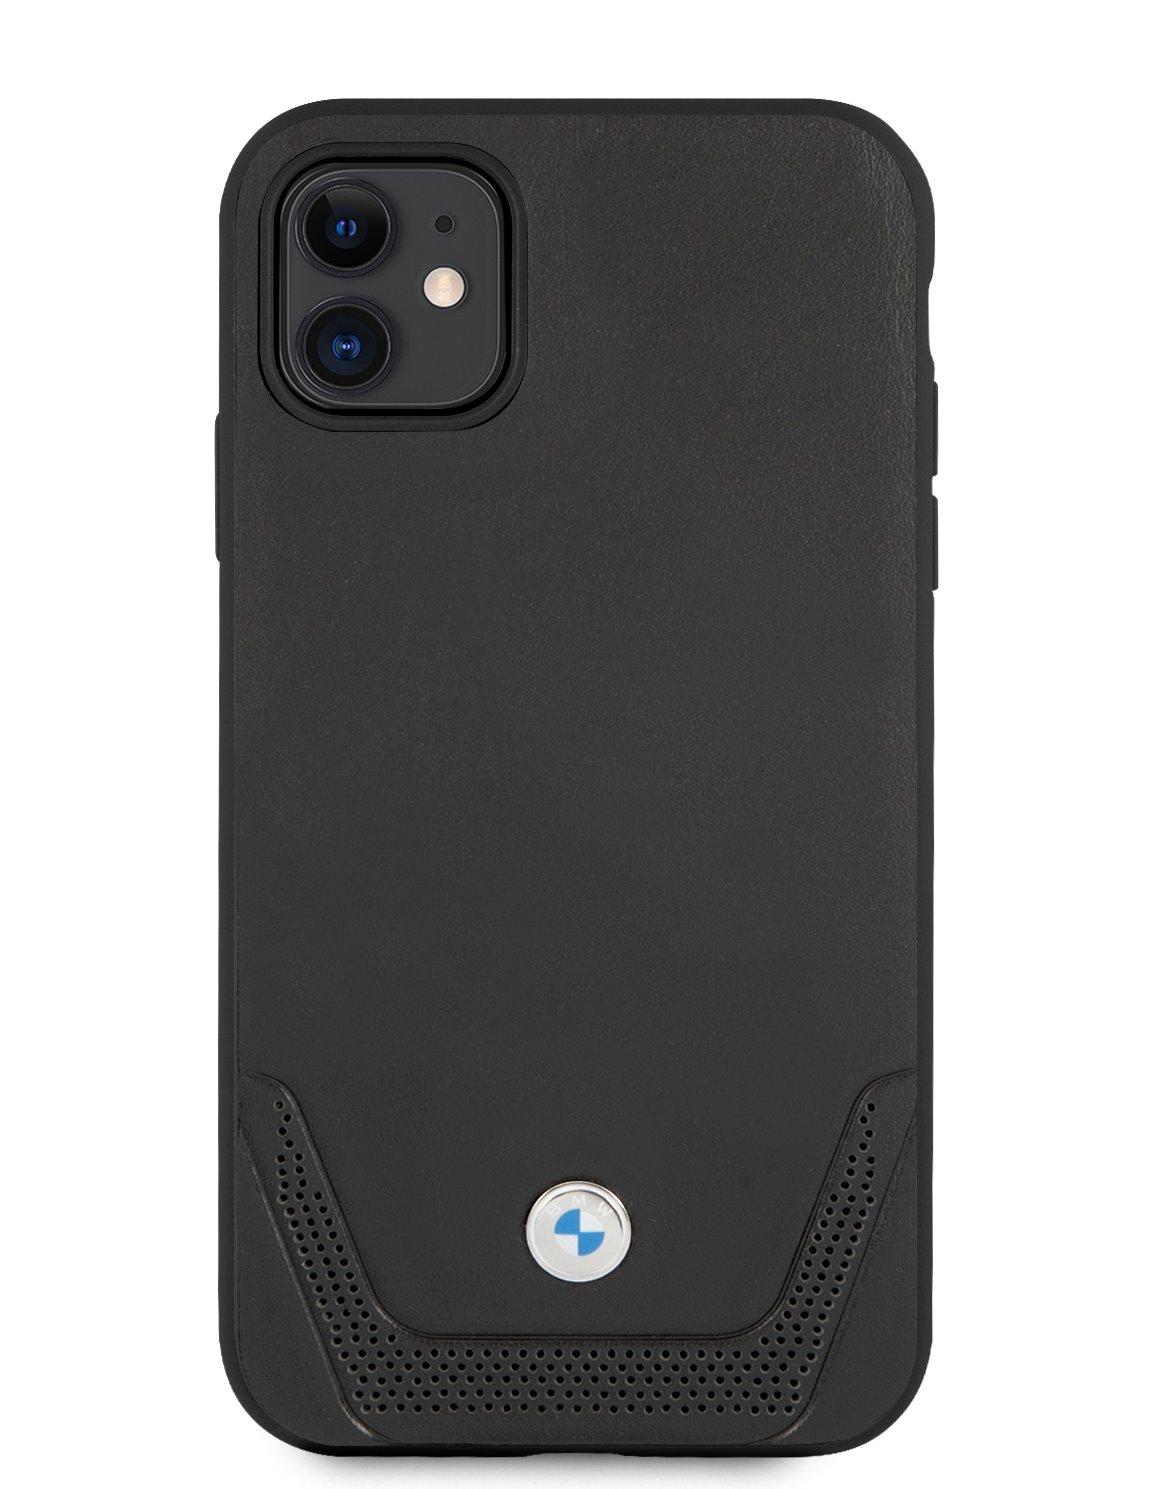 BMHCN61RSWPK BMW Signature Leather Lower Stripe Kryt pro iPhone 11 Black 3666339011802